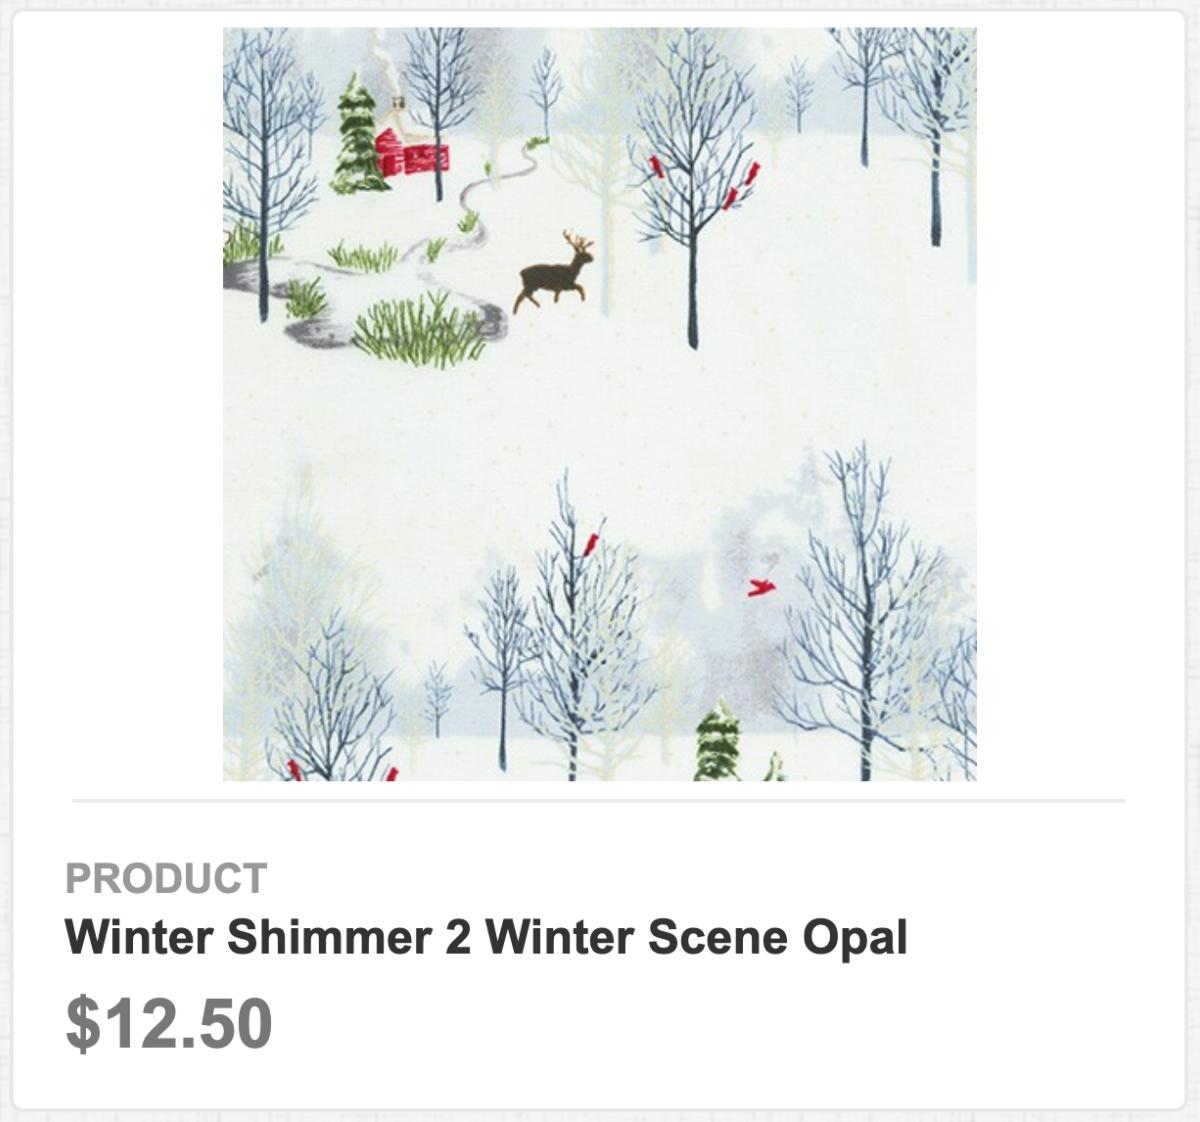 Winter Shimmer 2 Winter Scene Opal